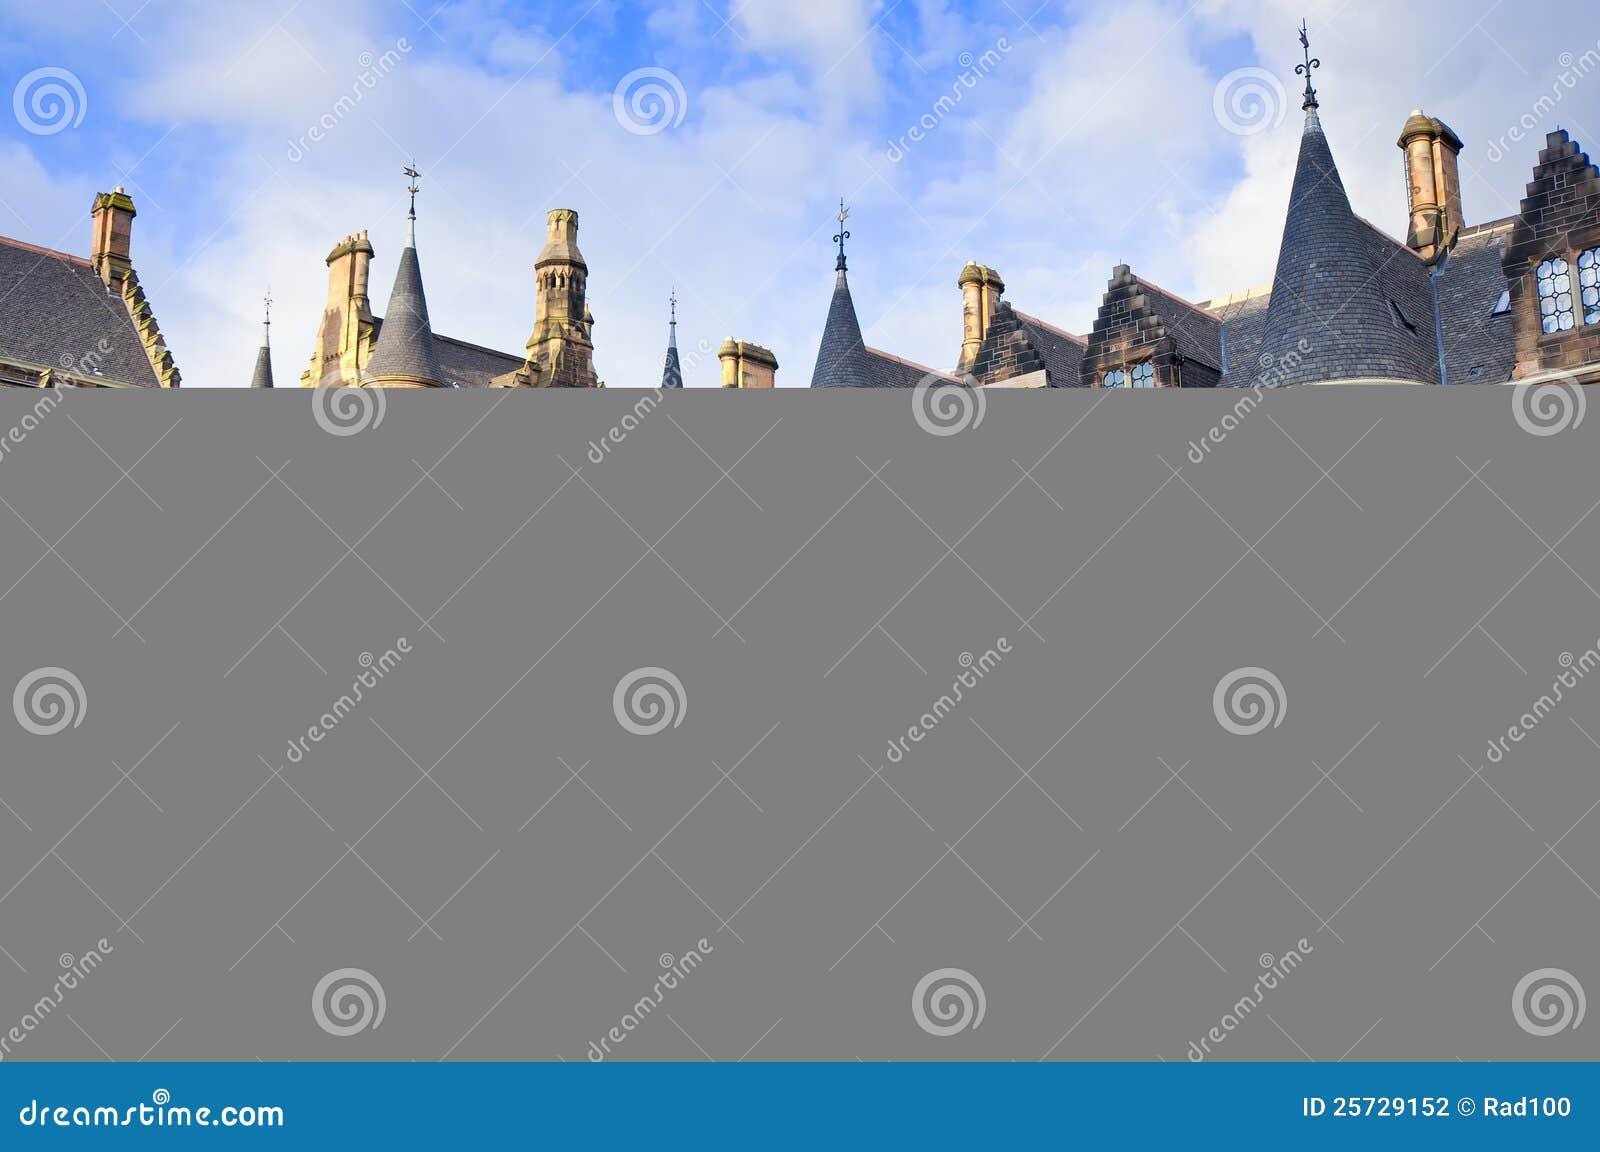 University of Glasgow,